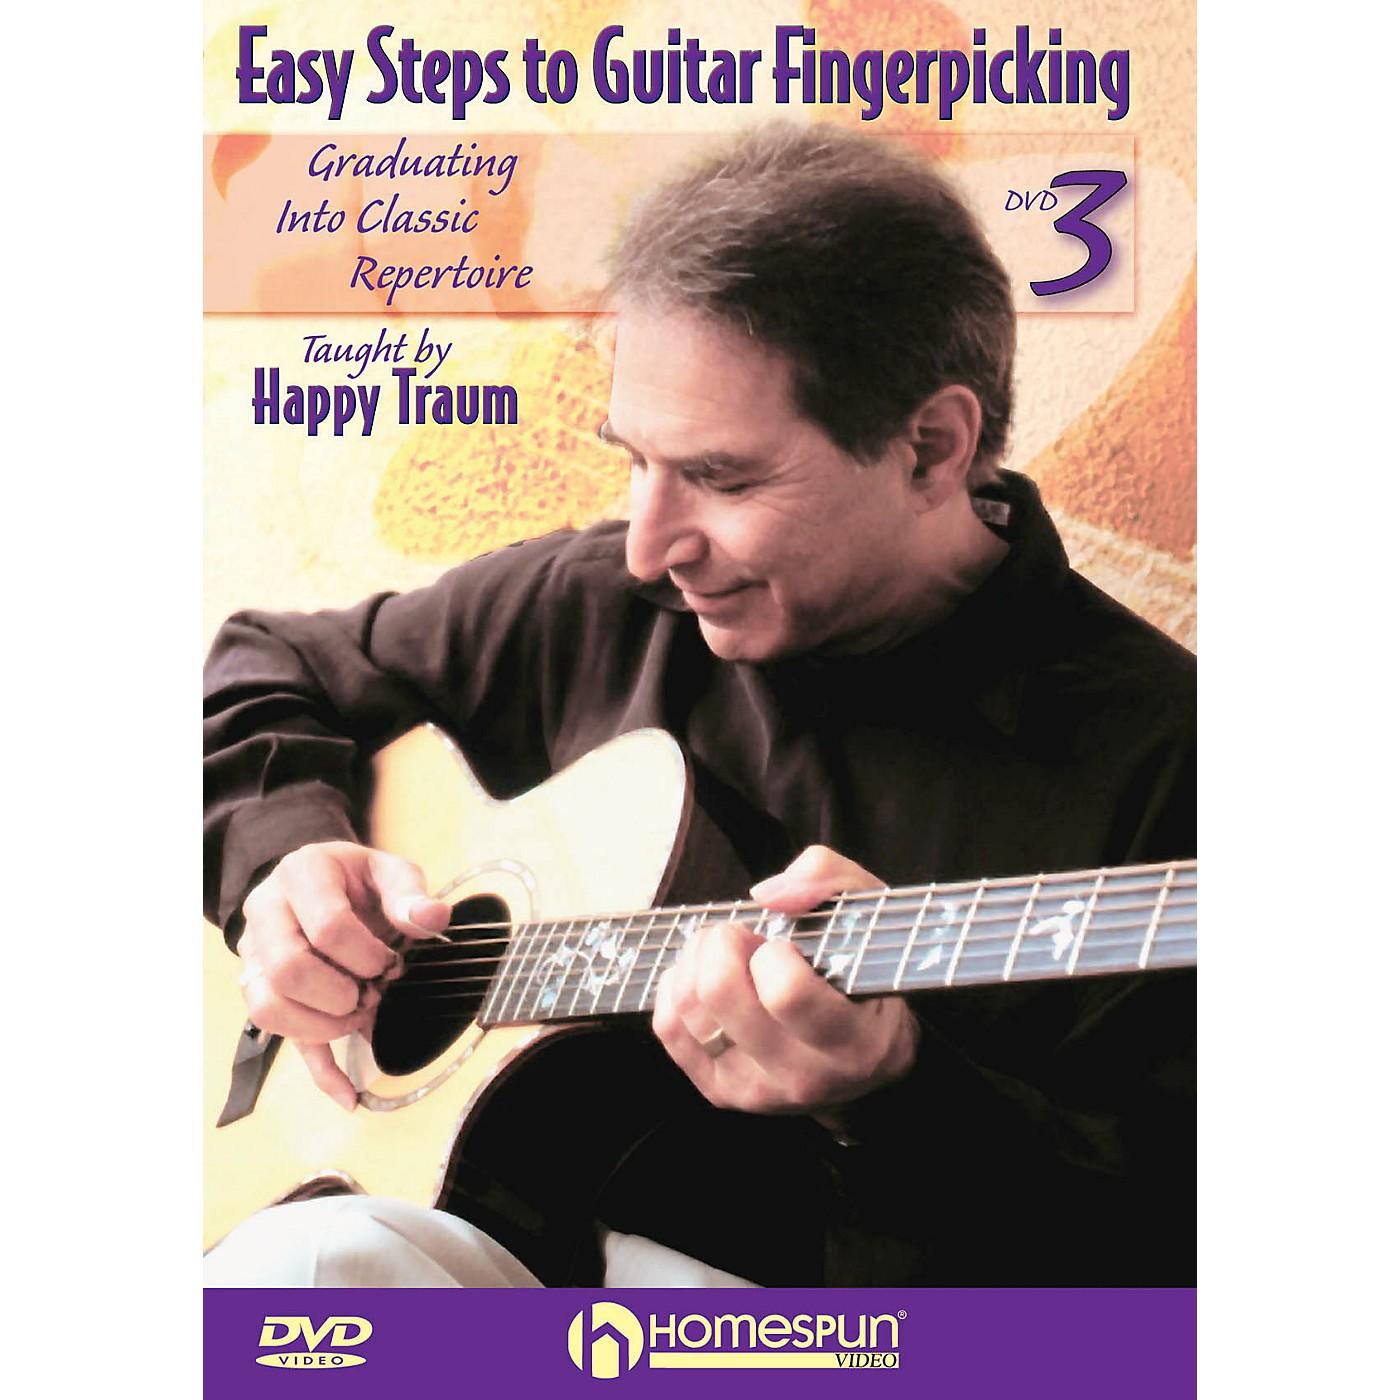 Homespun Easy Steps to Guitar Fingerpicking Instructional/Guitar/DVD Series DVD Written by Happy Traum thumbnail